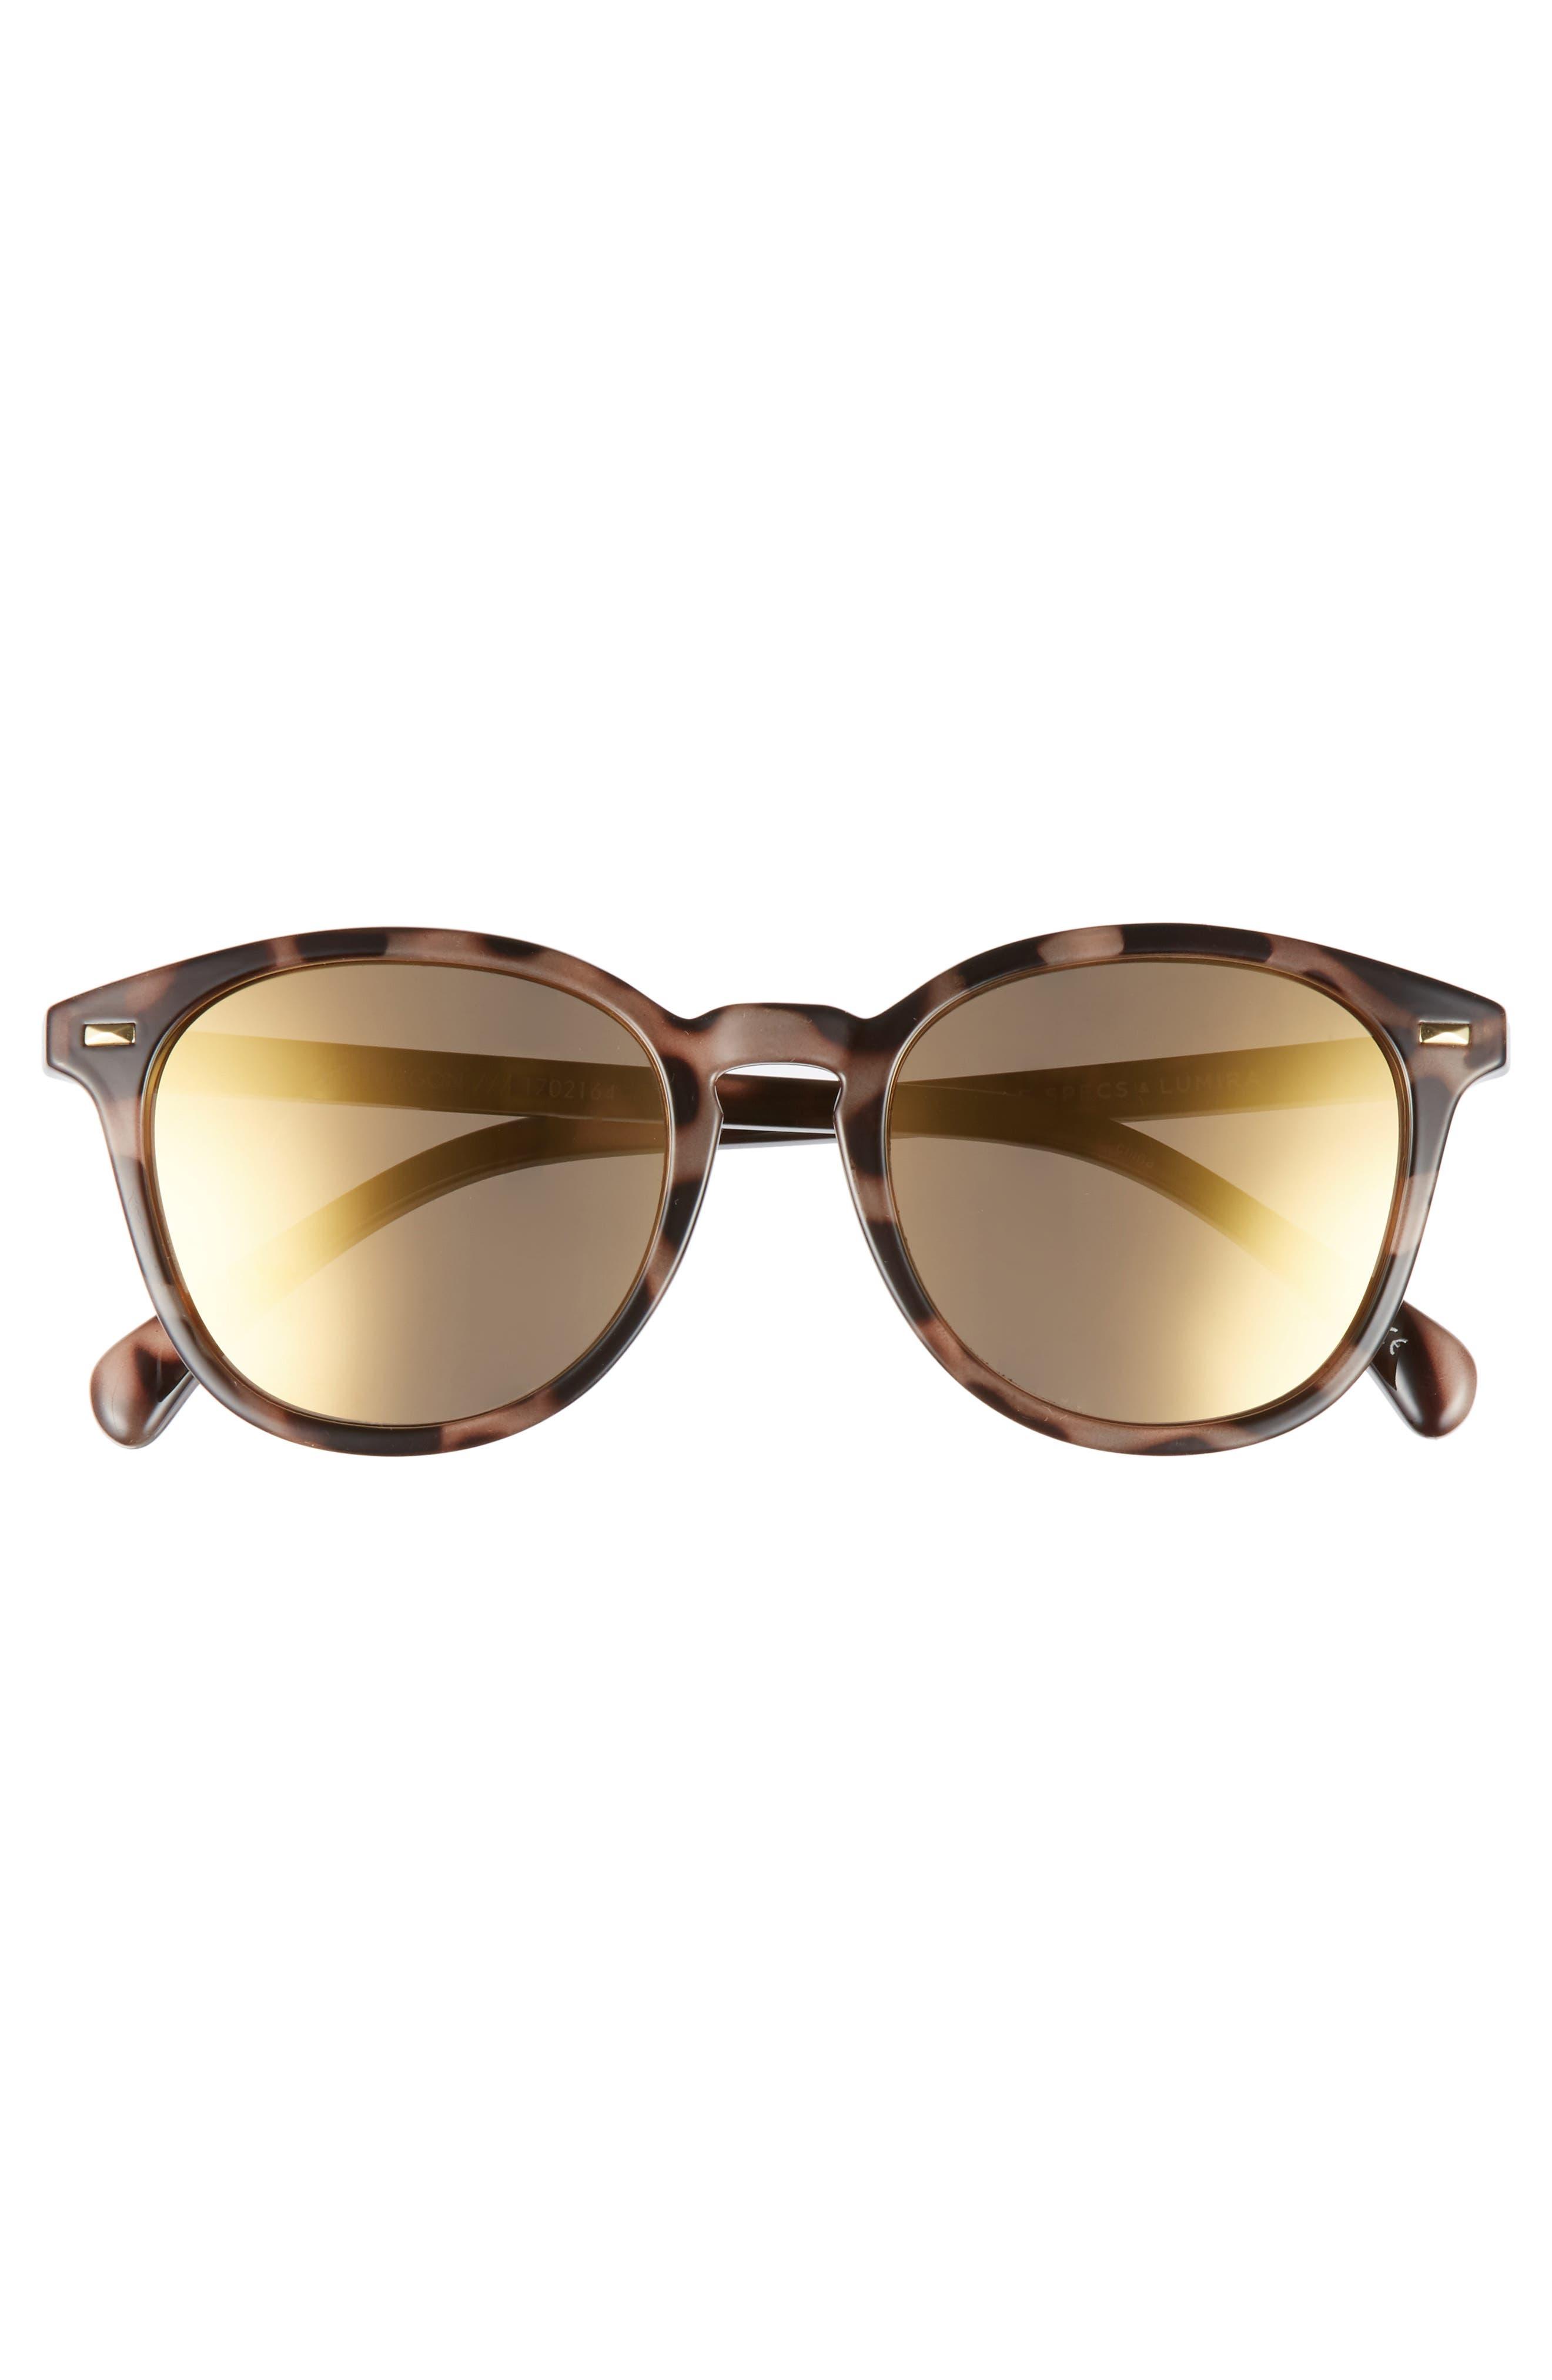 x Lumira Bandwagon 51mm Sunglasses & Candle Gift Set,                             Alternate thumbnail 4, color,                             Volcanic Tort